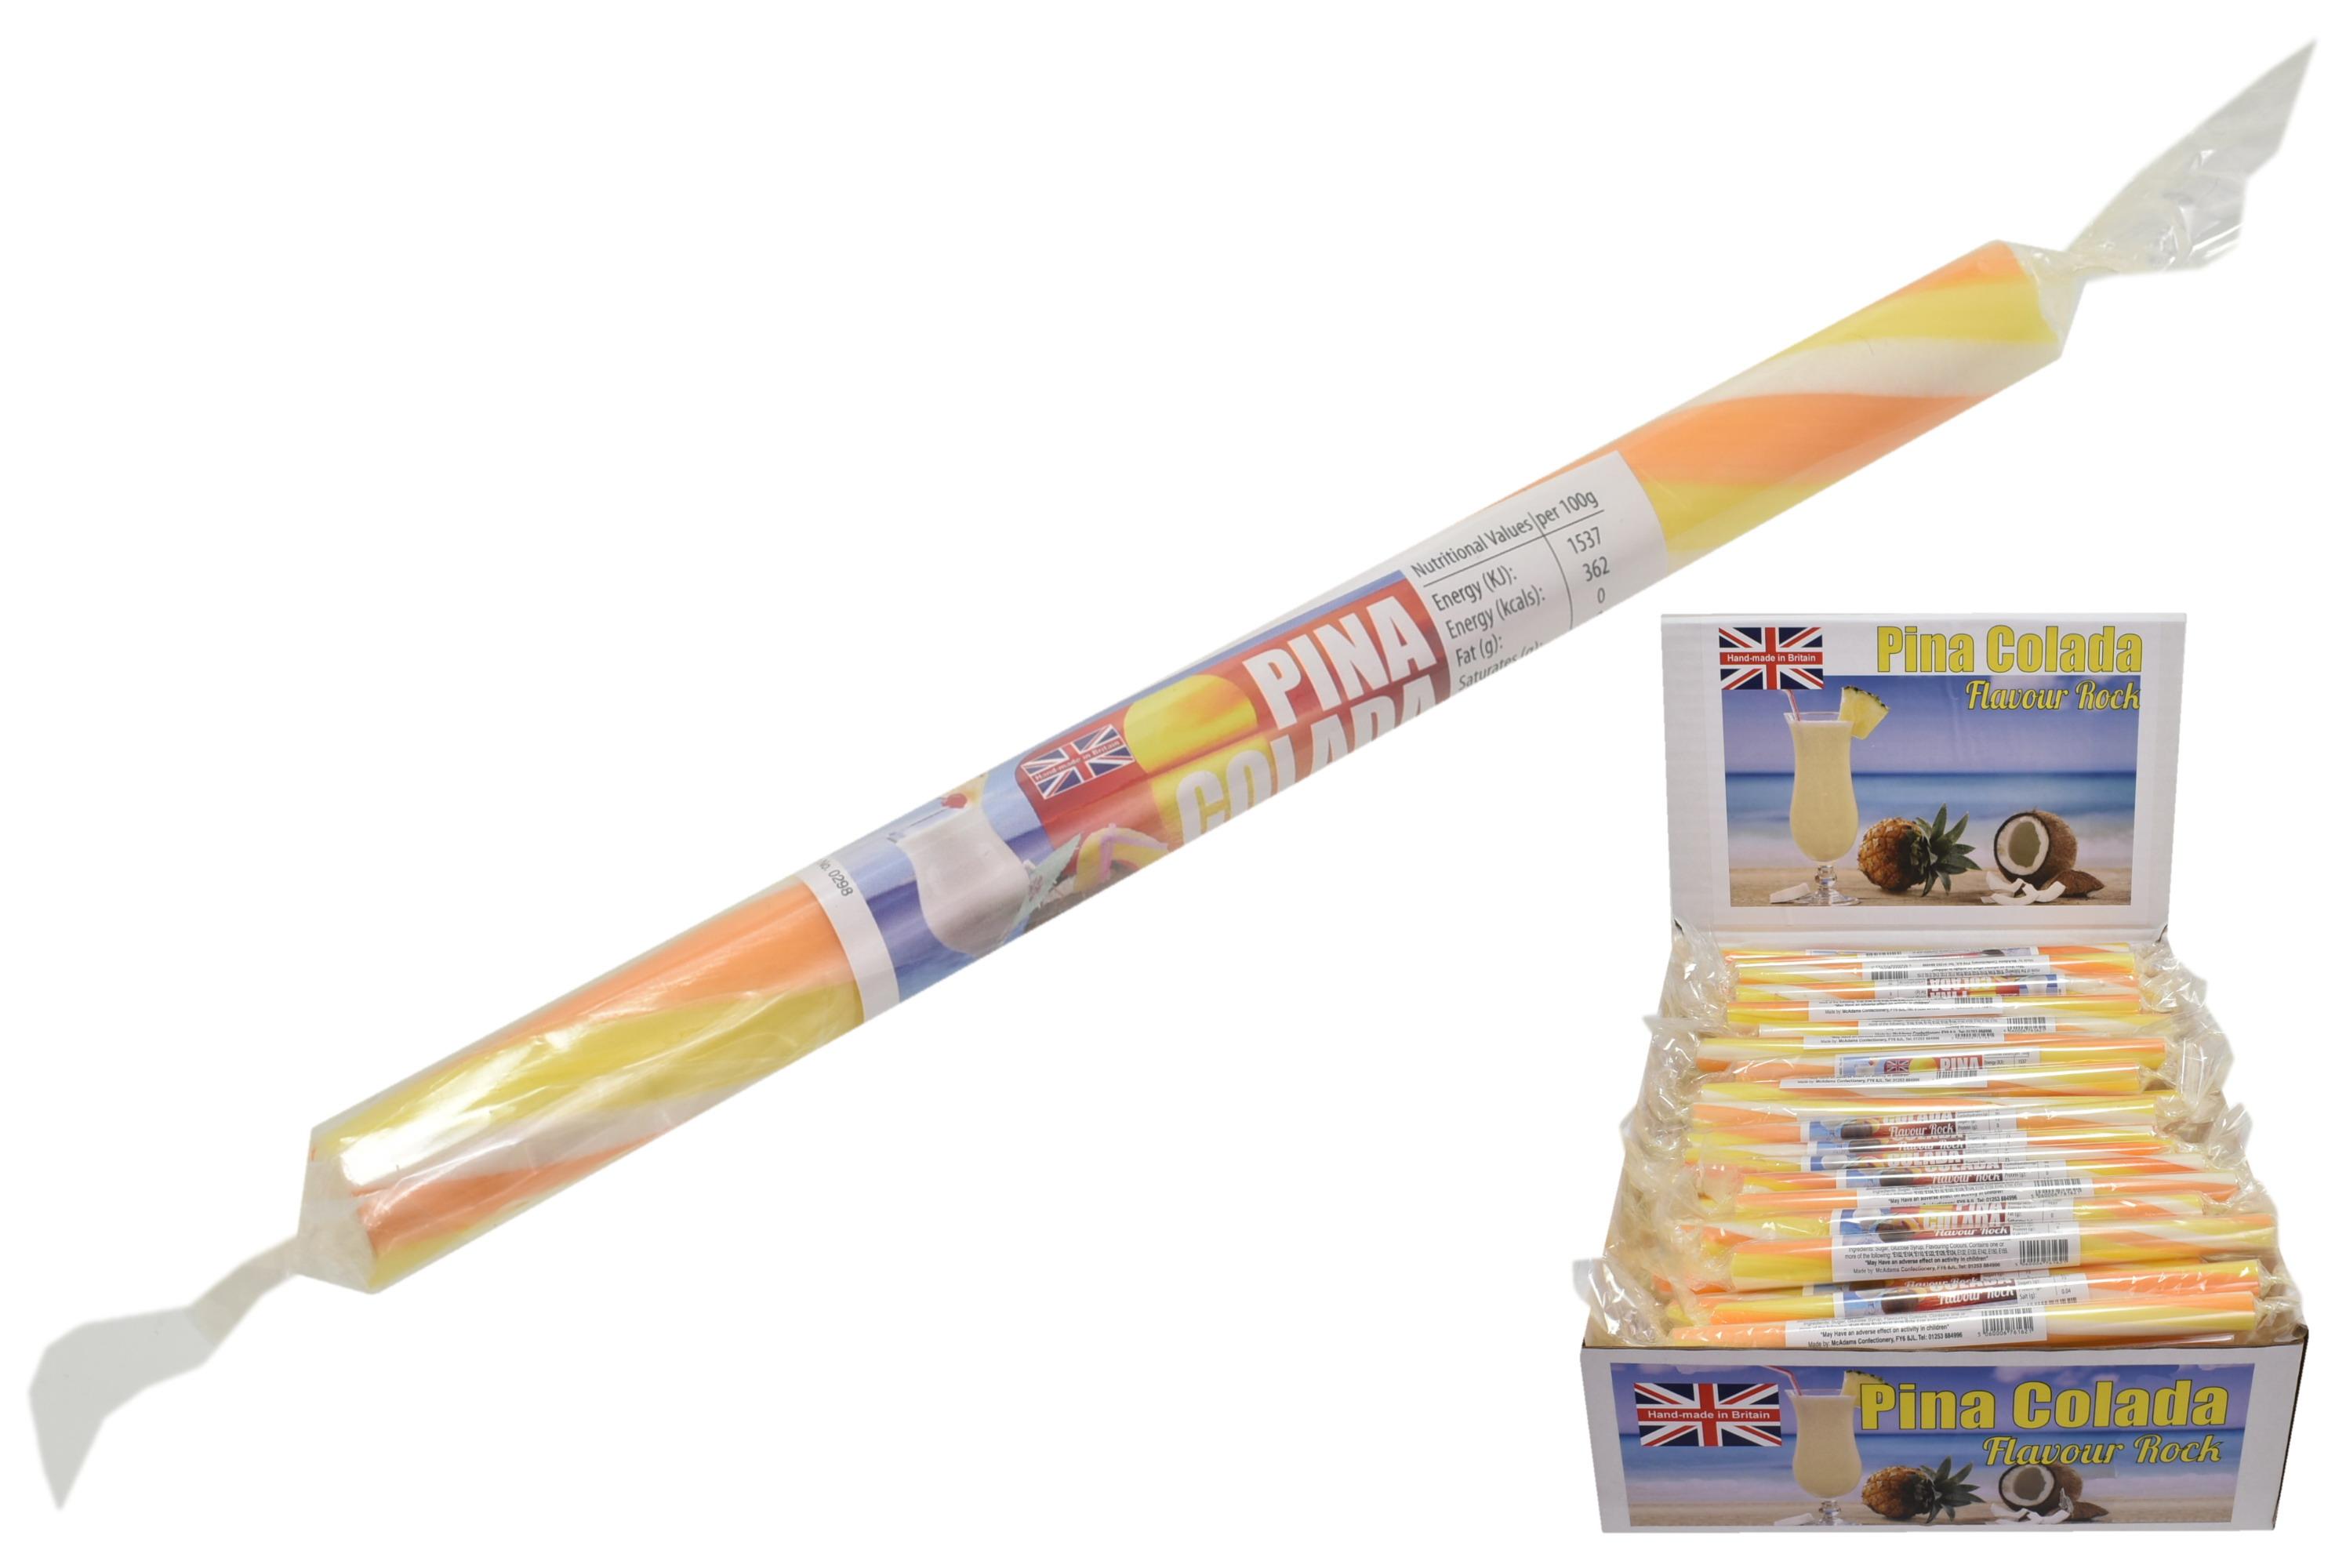 Pina Colada - Flavoured Rock Sticks